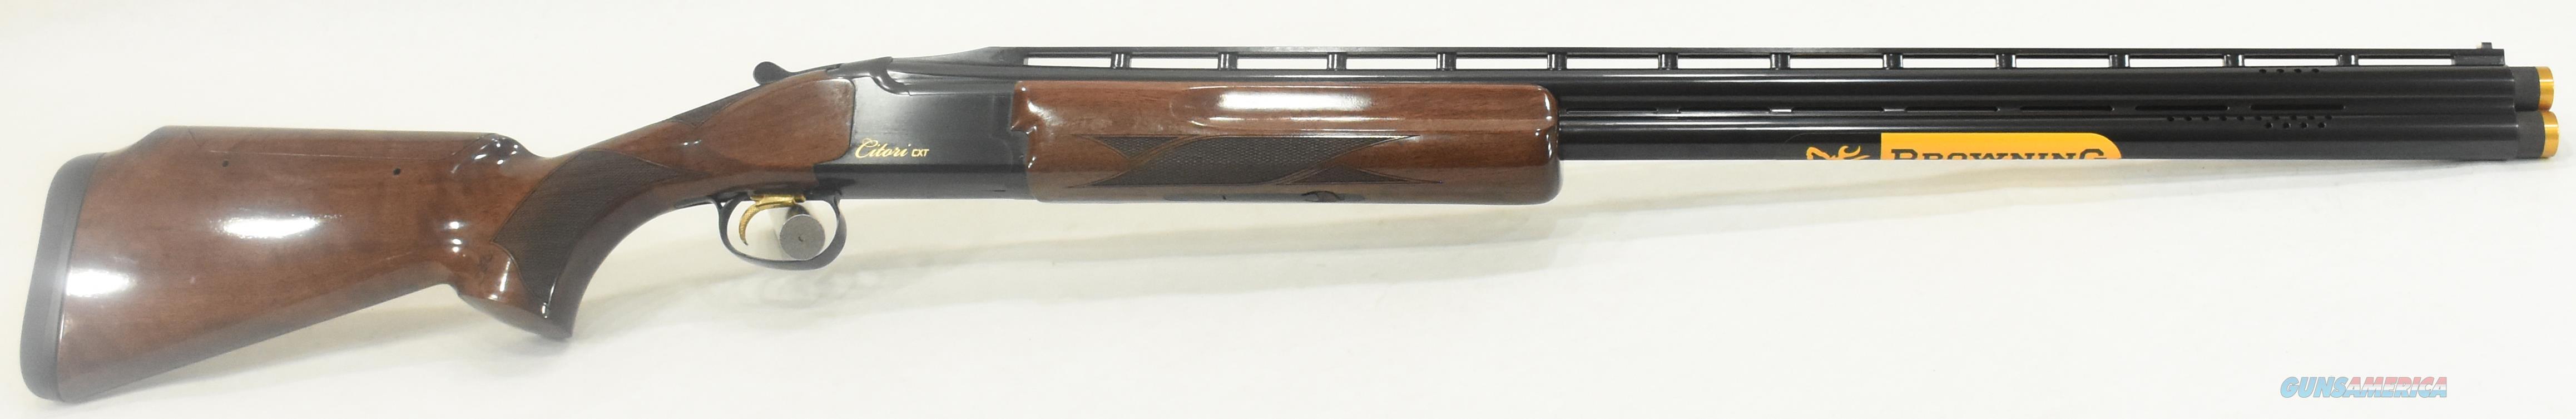 Citori CXT Adjustable 12Ga 30-3In 018075326  Guns > Shotguns > Browning Shotguns > Over Unders > Citori > Hunting